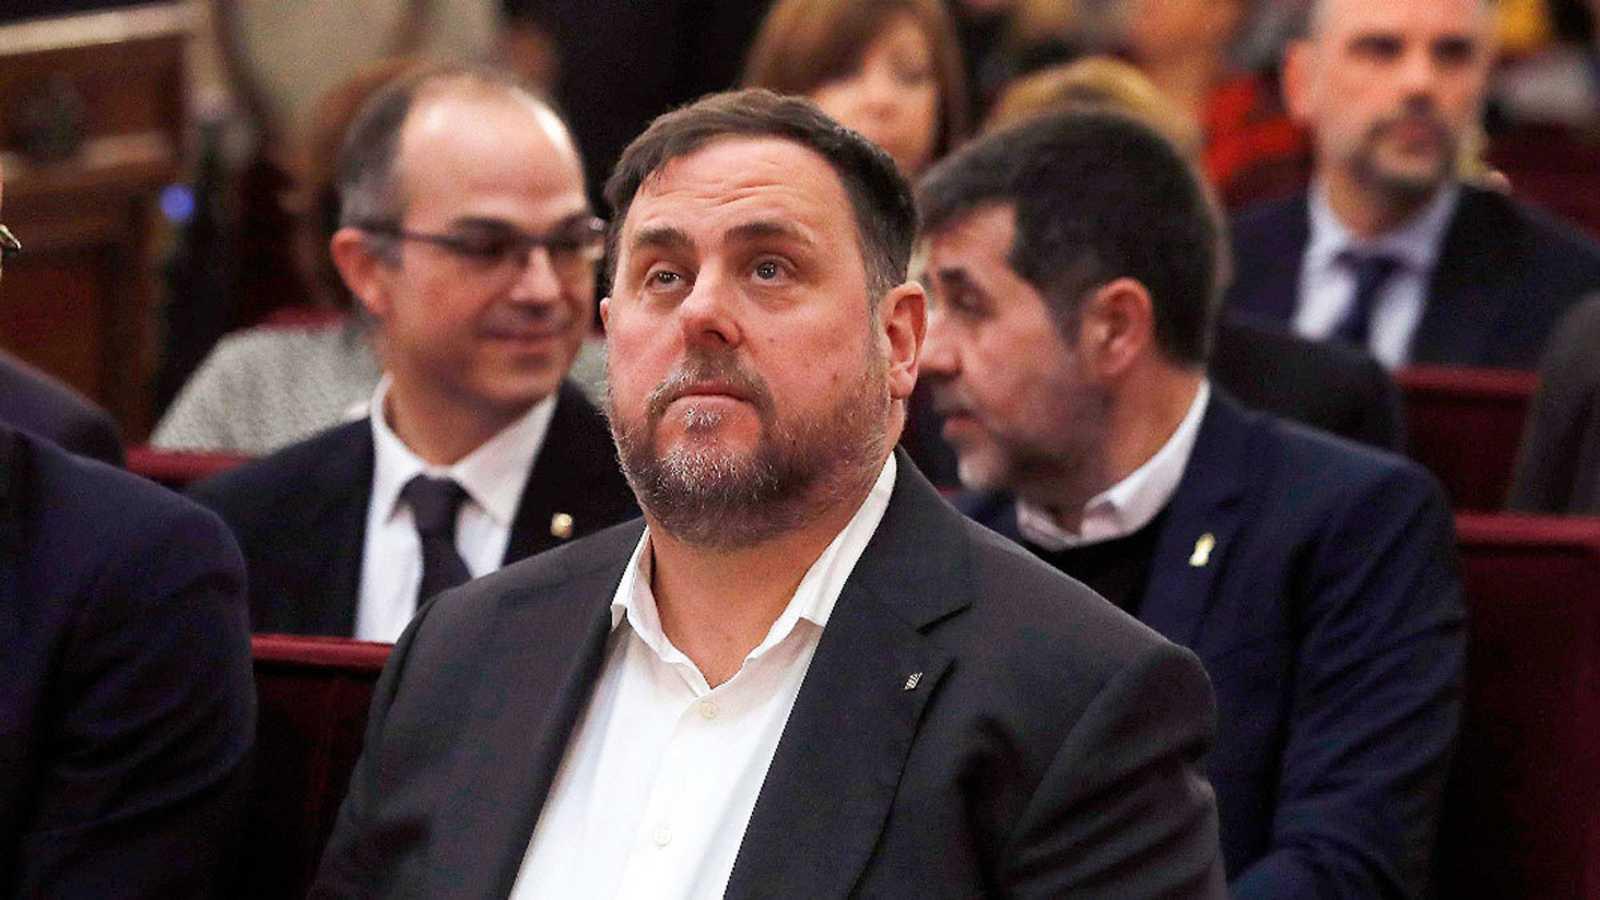 El Parlamento Europeo reconoce a Junqueras, Puigdemont y Comín como eurodiputados